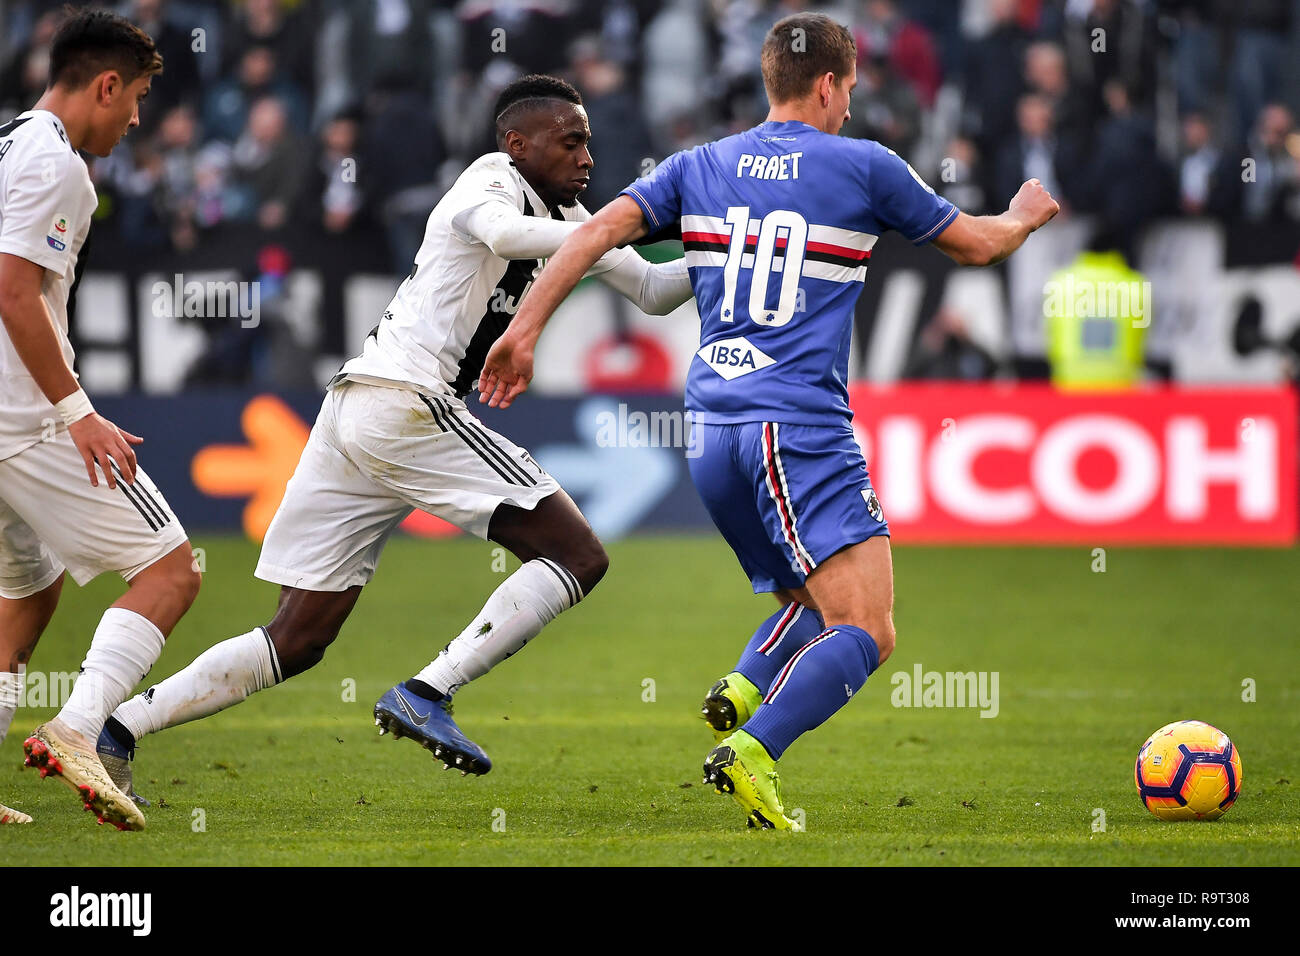 d062fb52d5b1 Foto LaPresse - Marco Alpozzi 29 Dicembre 2018 Torino, Italia Sport Calcio  Juventus Fc vs